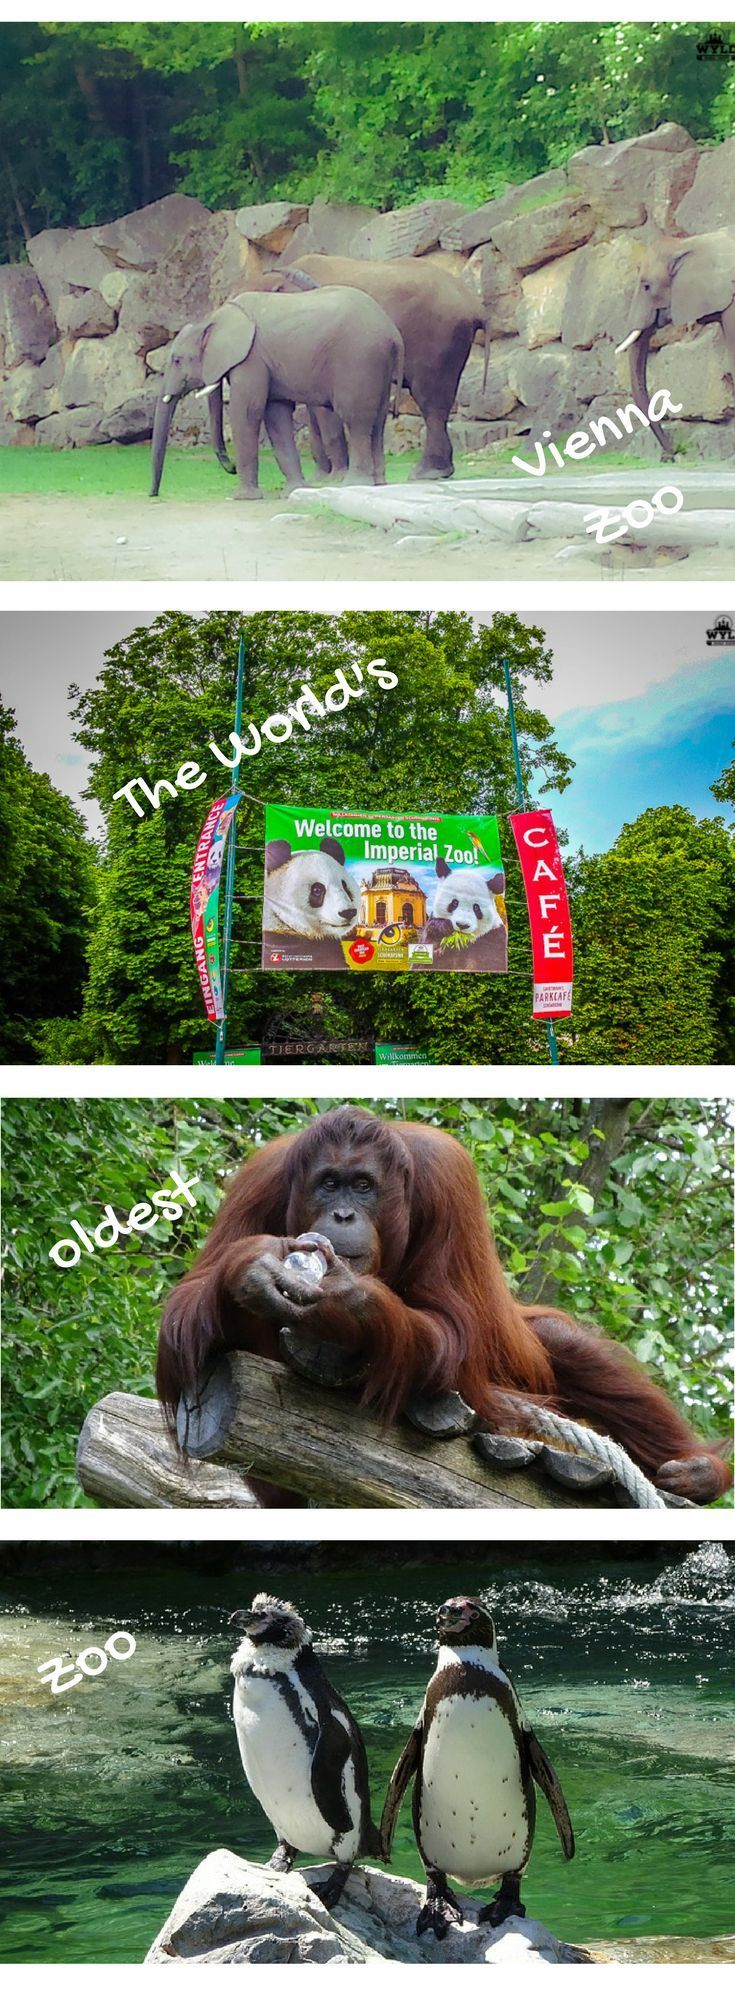 Schonbrunn Zoo, Vienna Zoo, Schonbrunn Palace, Panda Bears, Visiting Vienna, Vienna with kids, Vienna Attractions